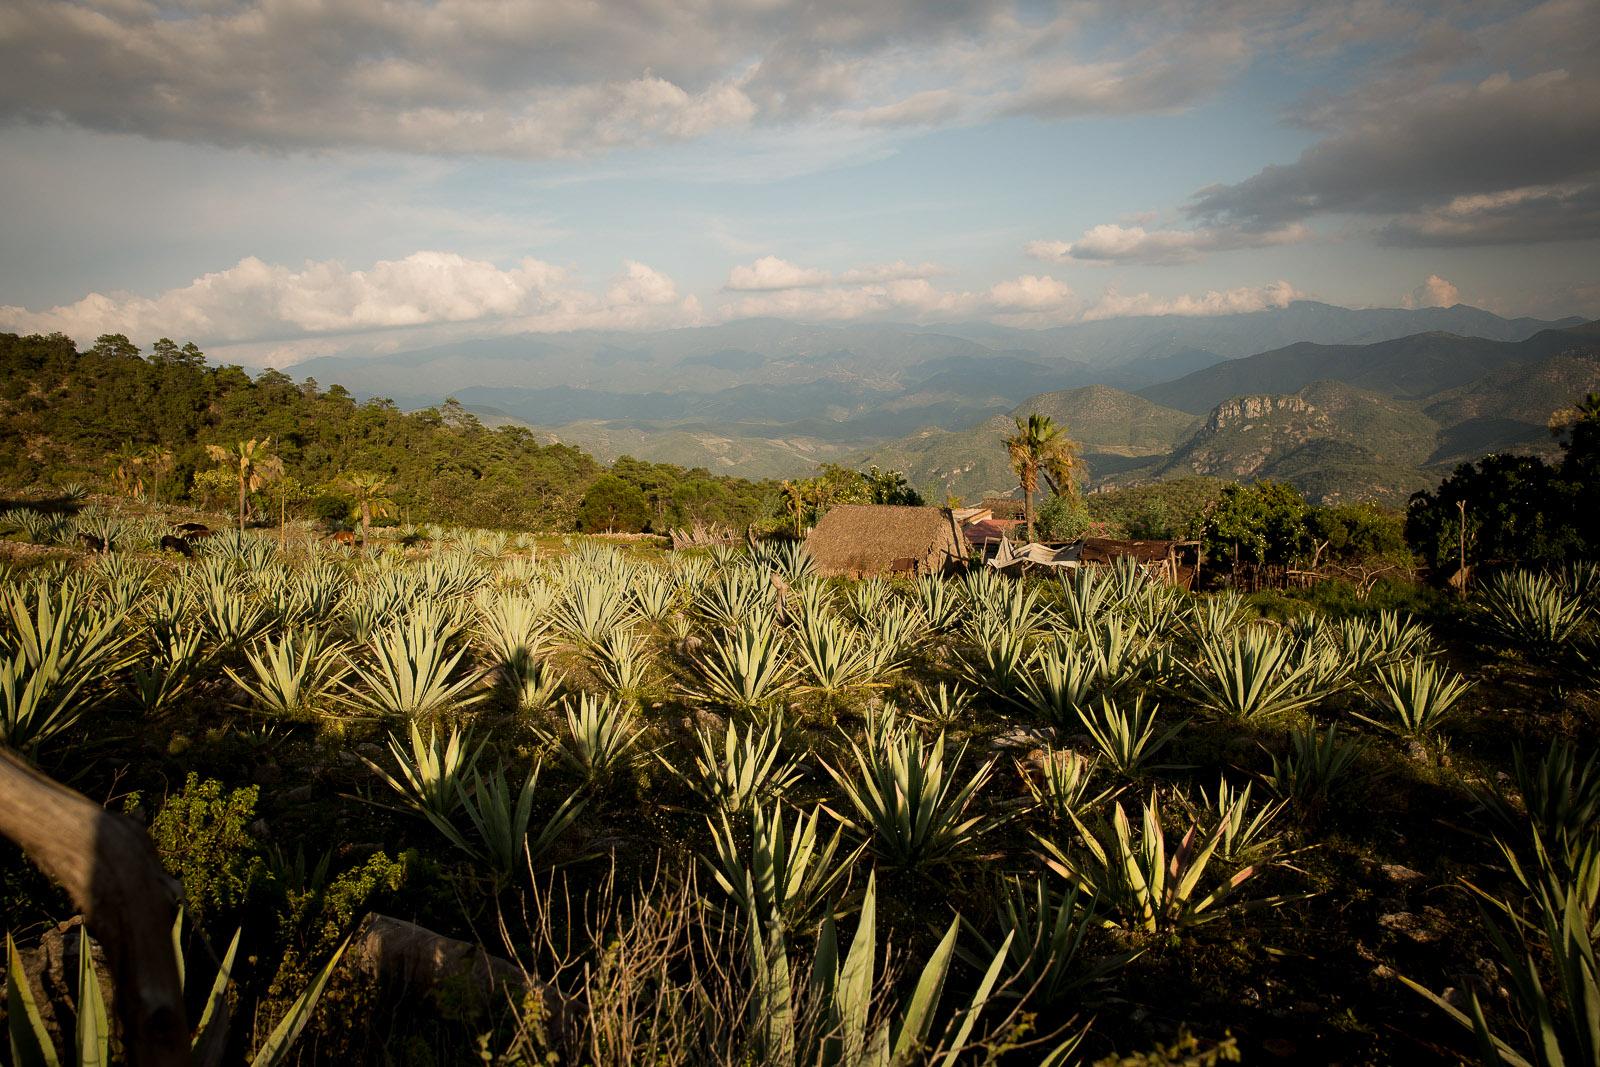 Agave Crop, Oaxaca, Mexico